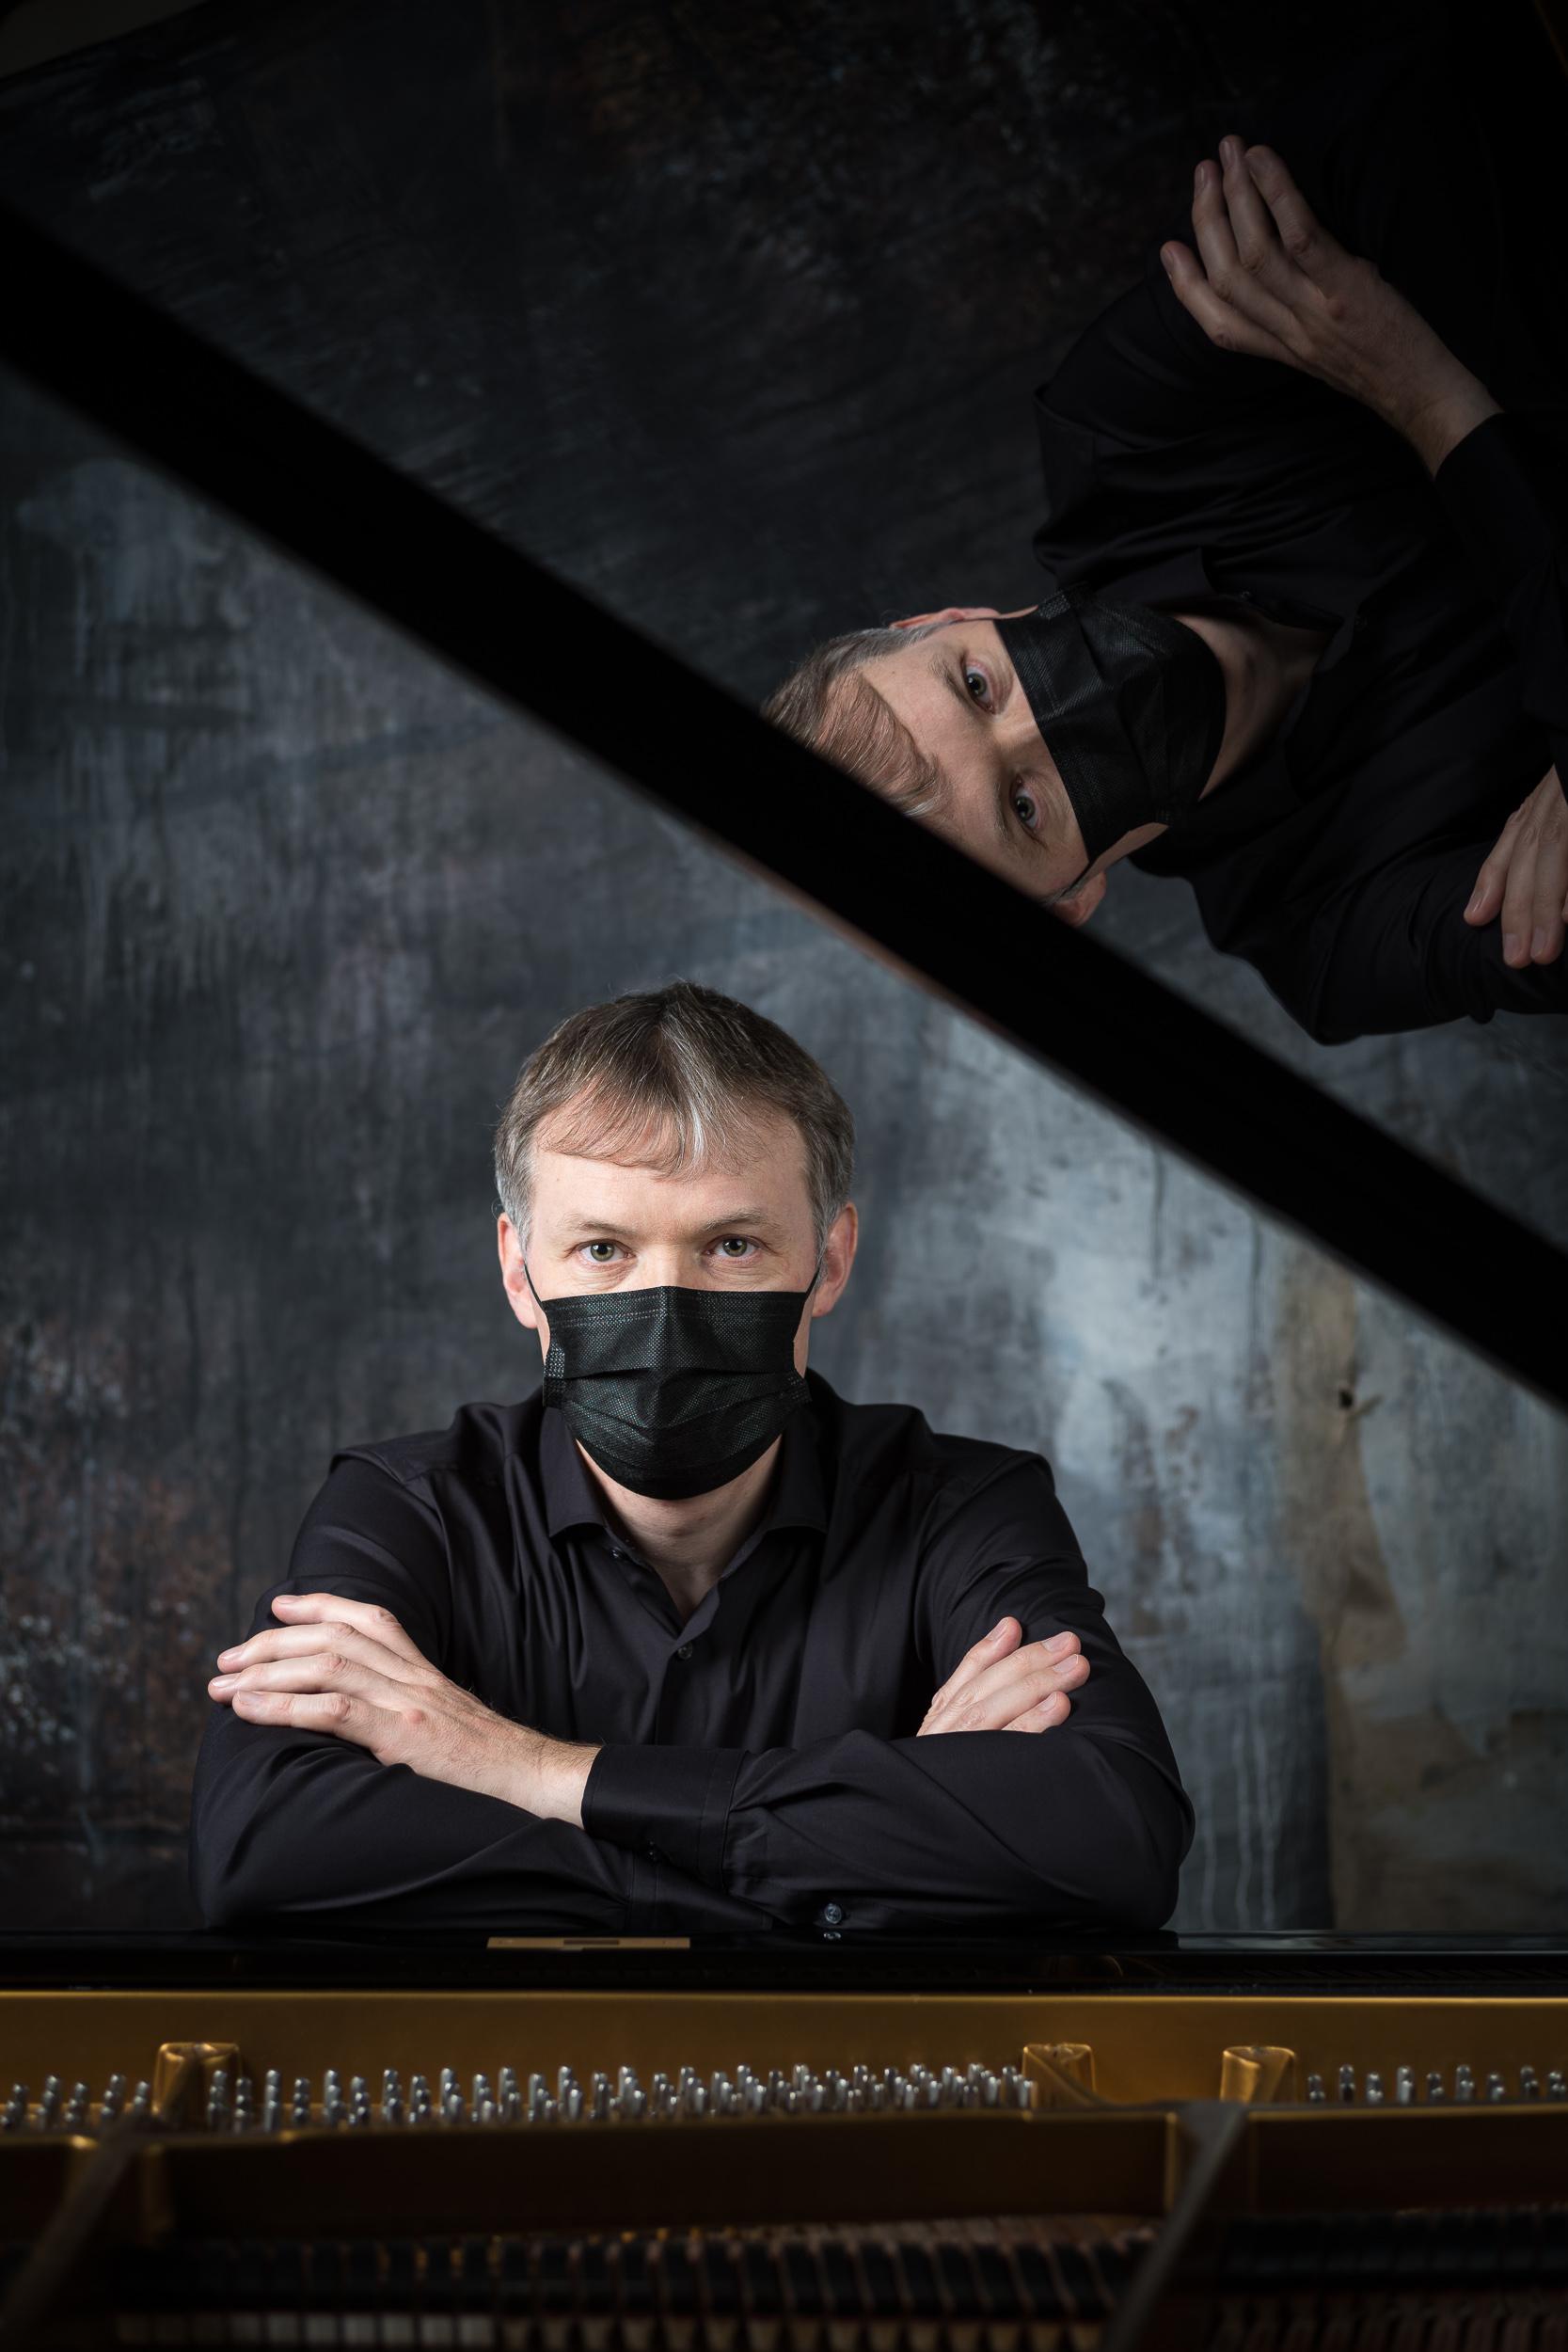 Reto Reichenbach Porträt mit Maske